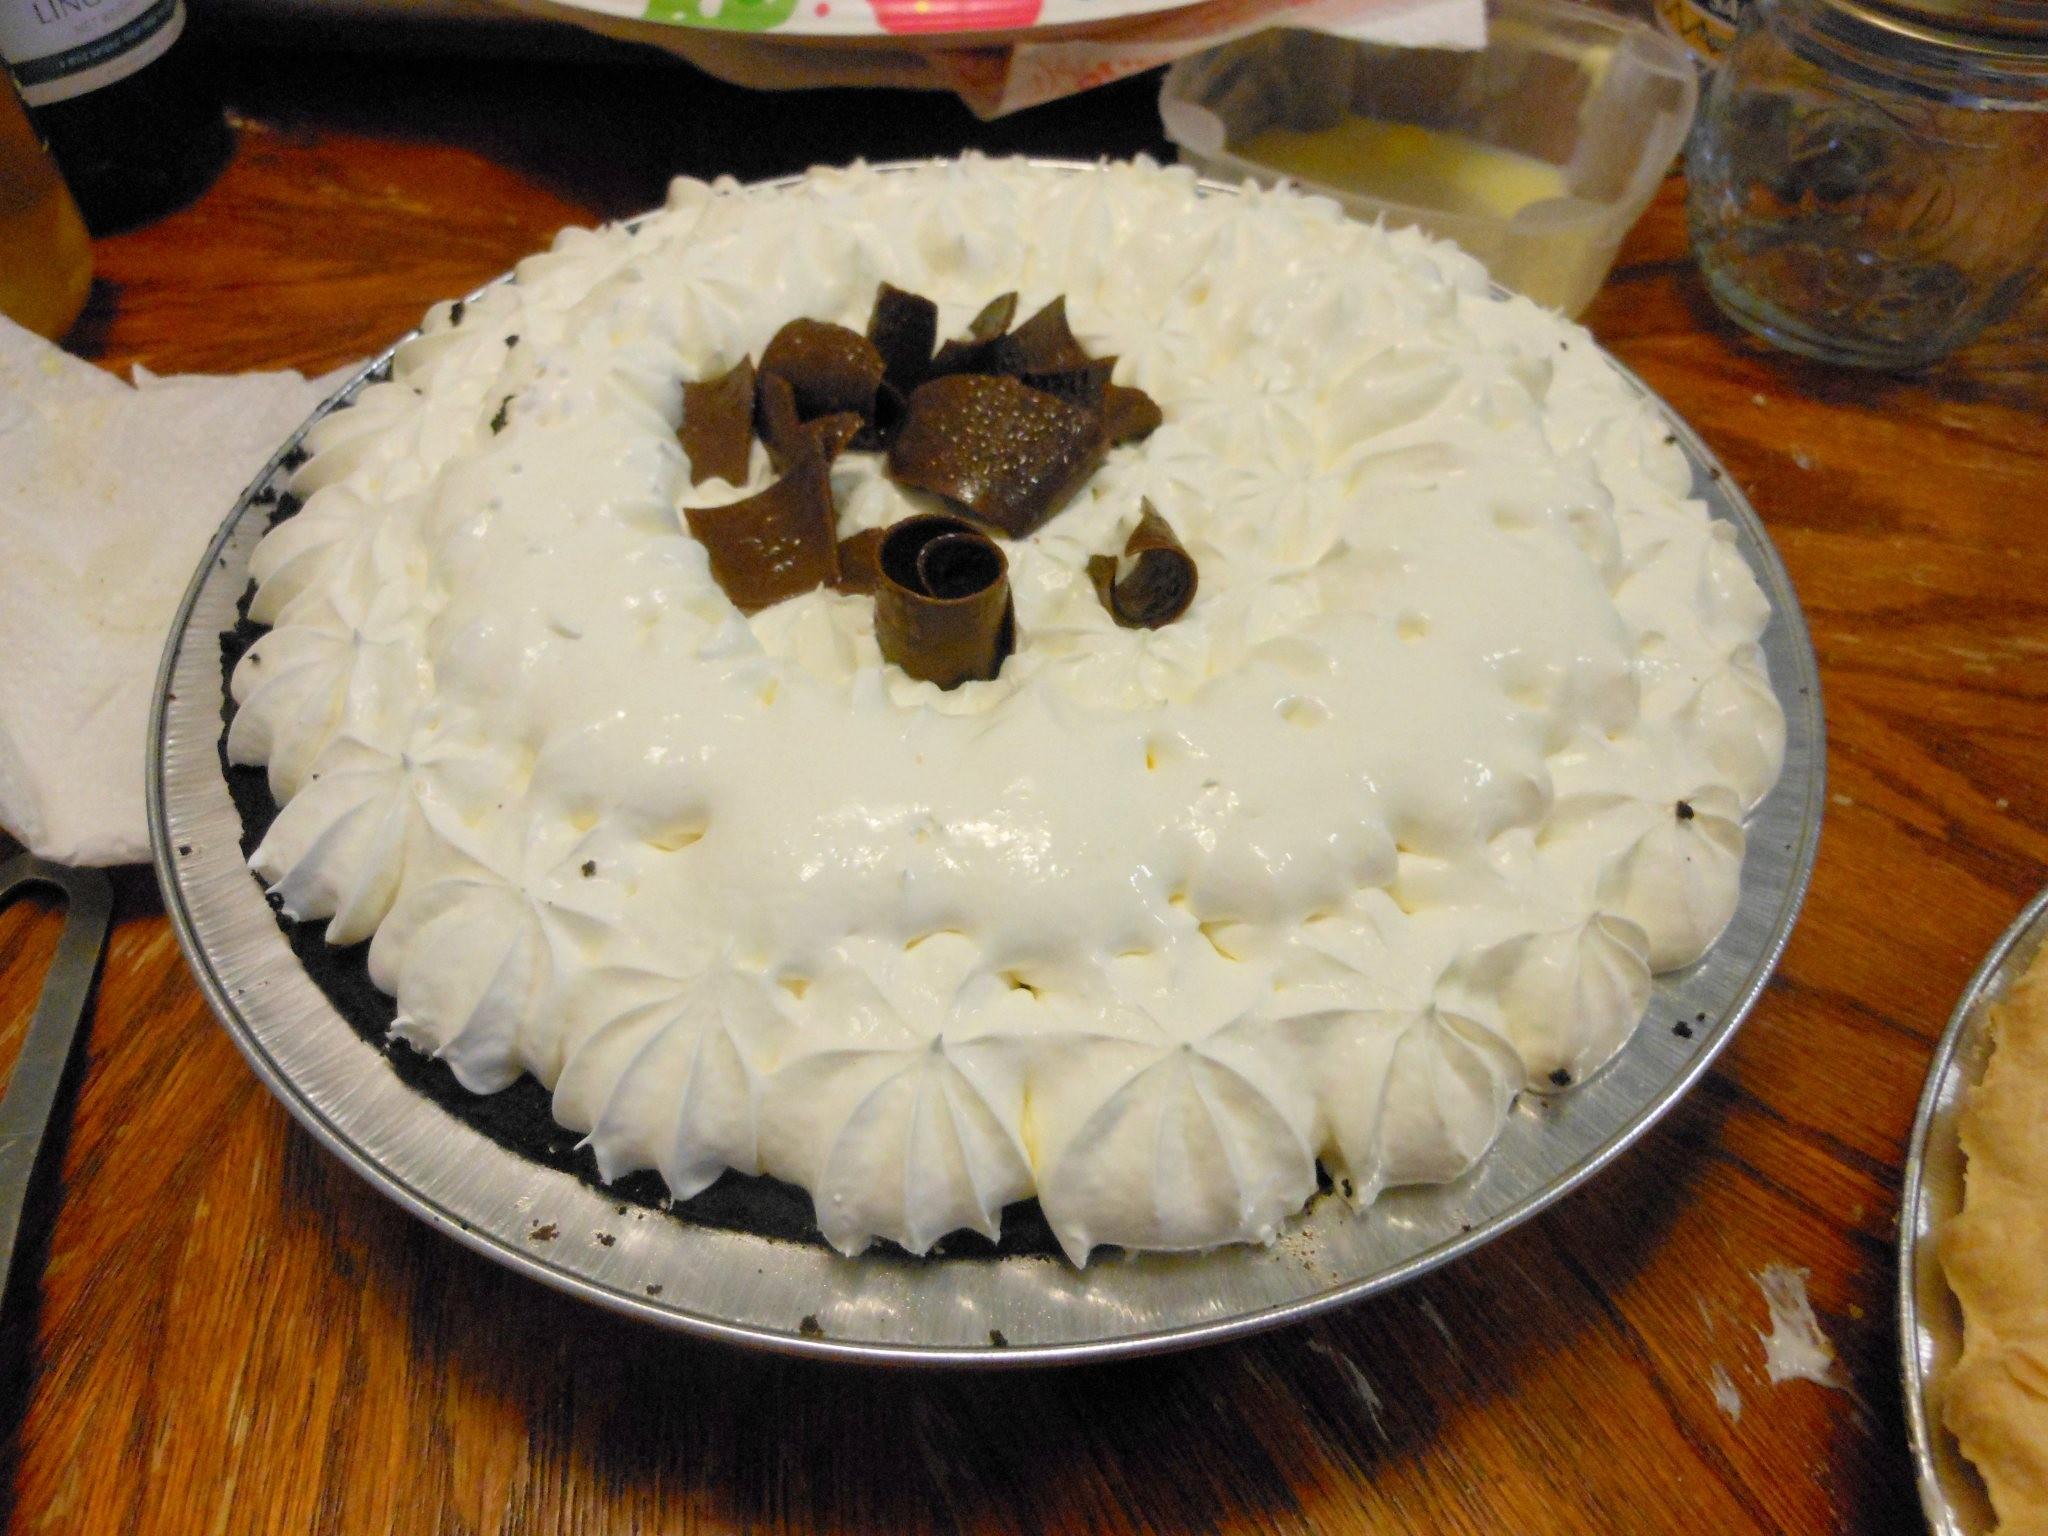 we had 2 marie calendar pies for dessert a lovely chocolate cream pie